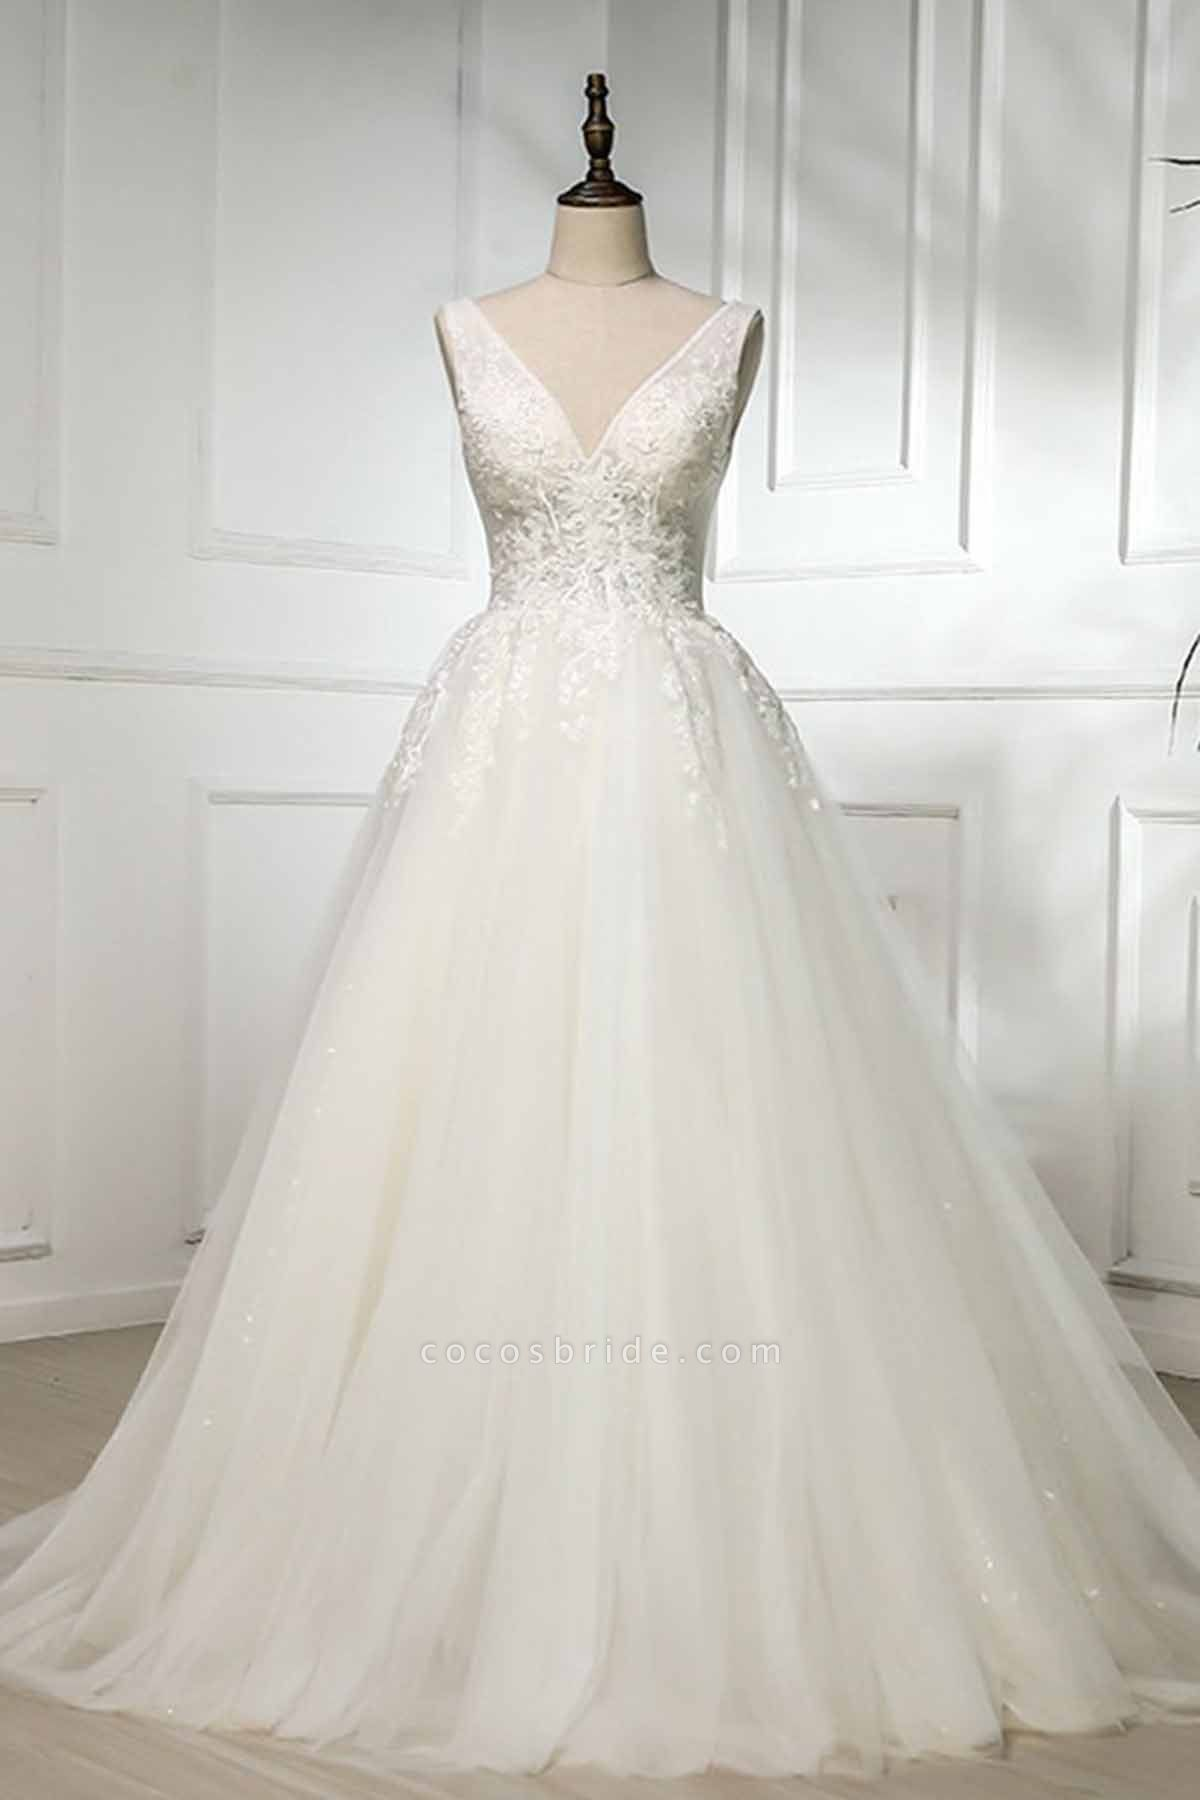 V Neck Long Lace White Lace Sweep Train Wedding Dress